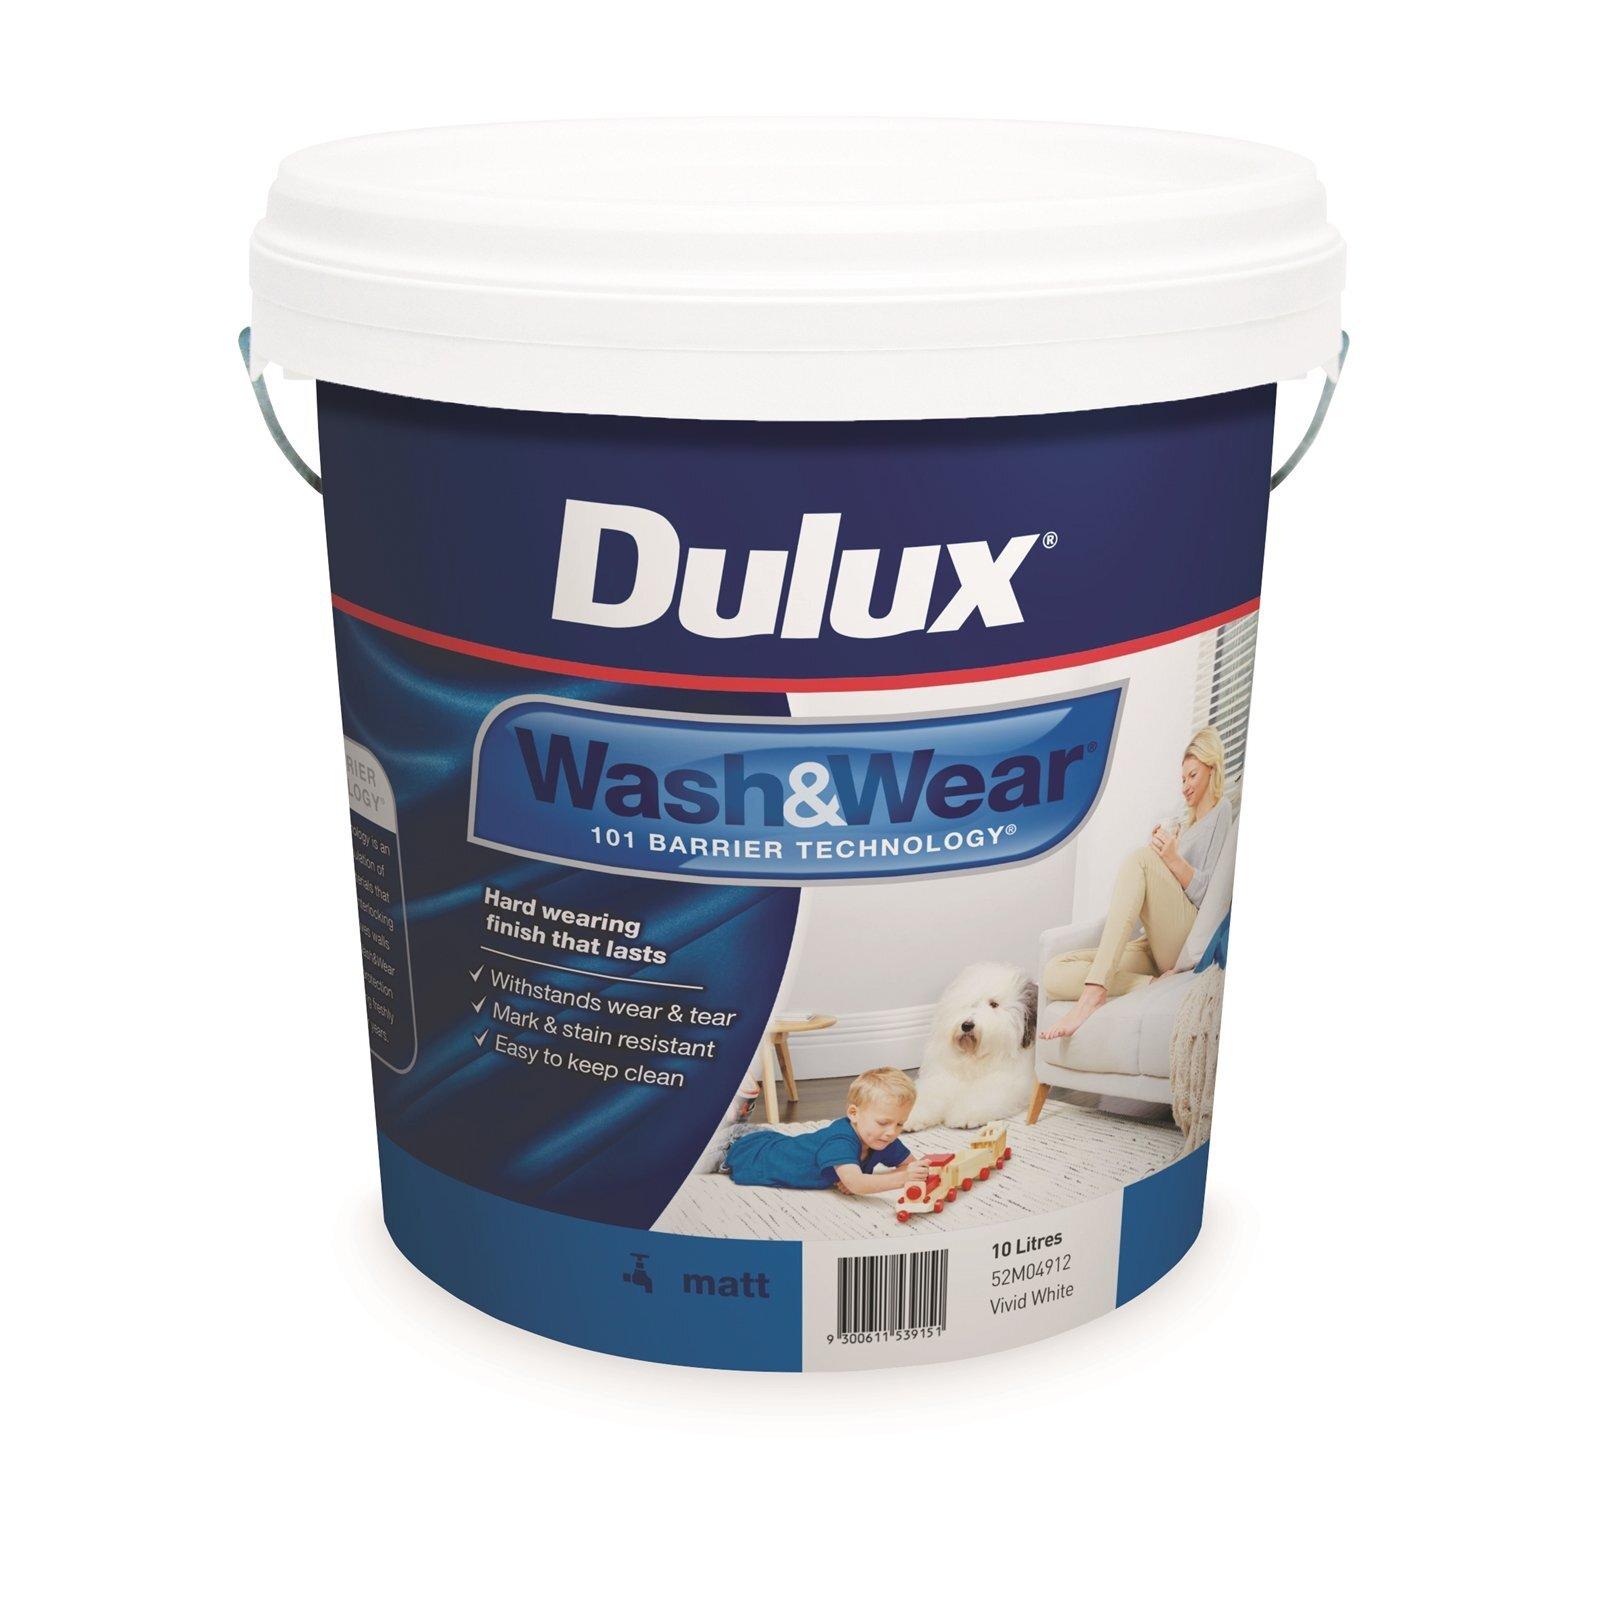 Dulux 10L Vivid White Wash & Wear Matt Interior Paint